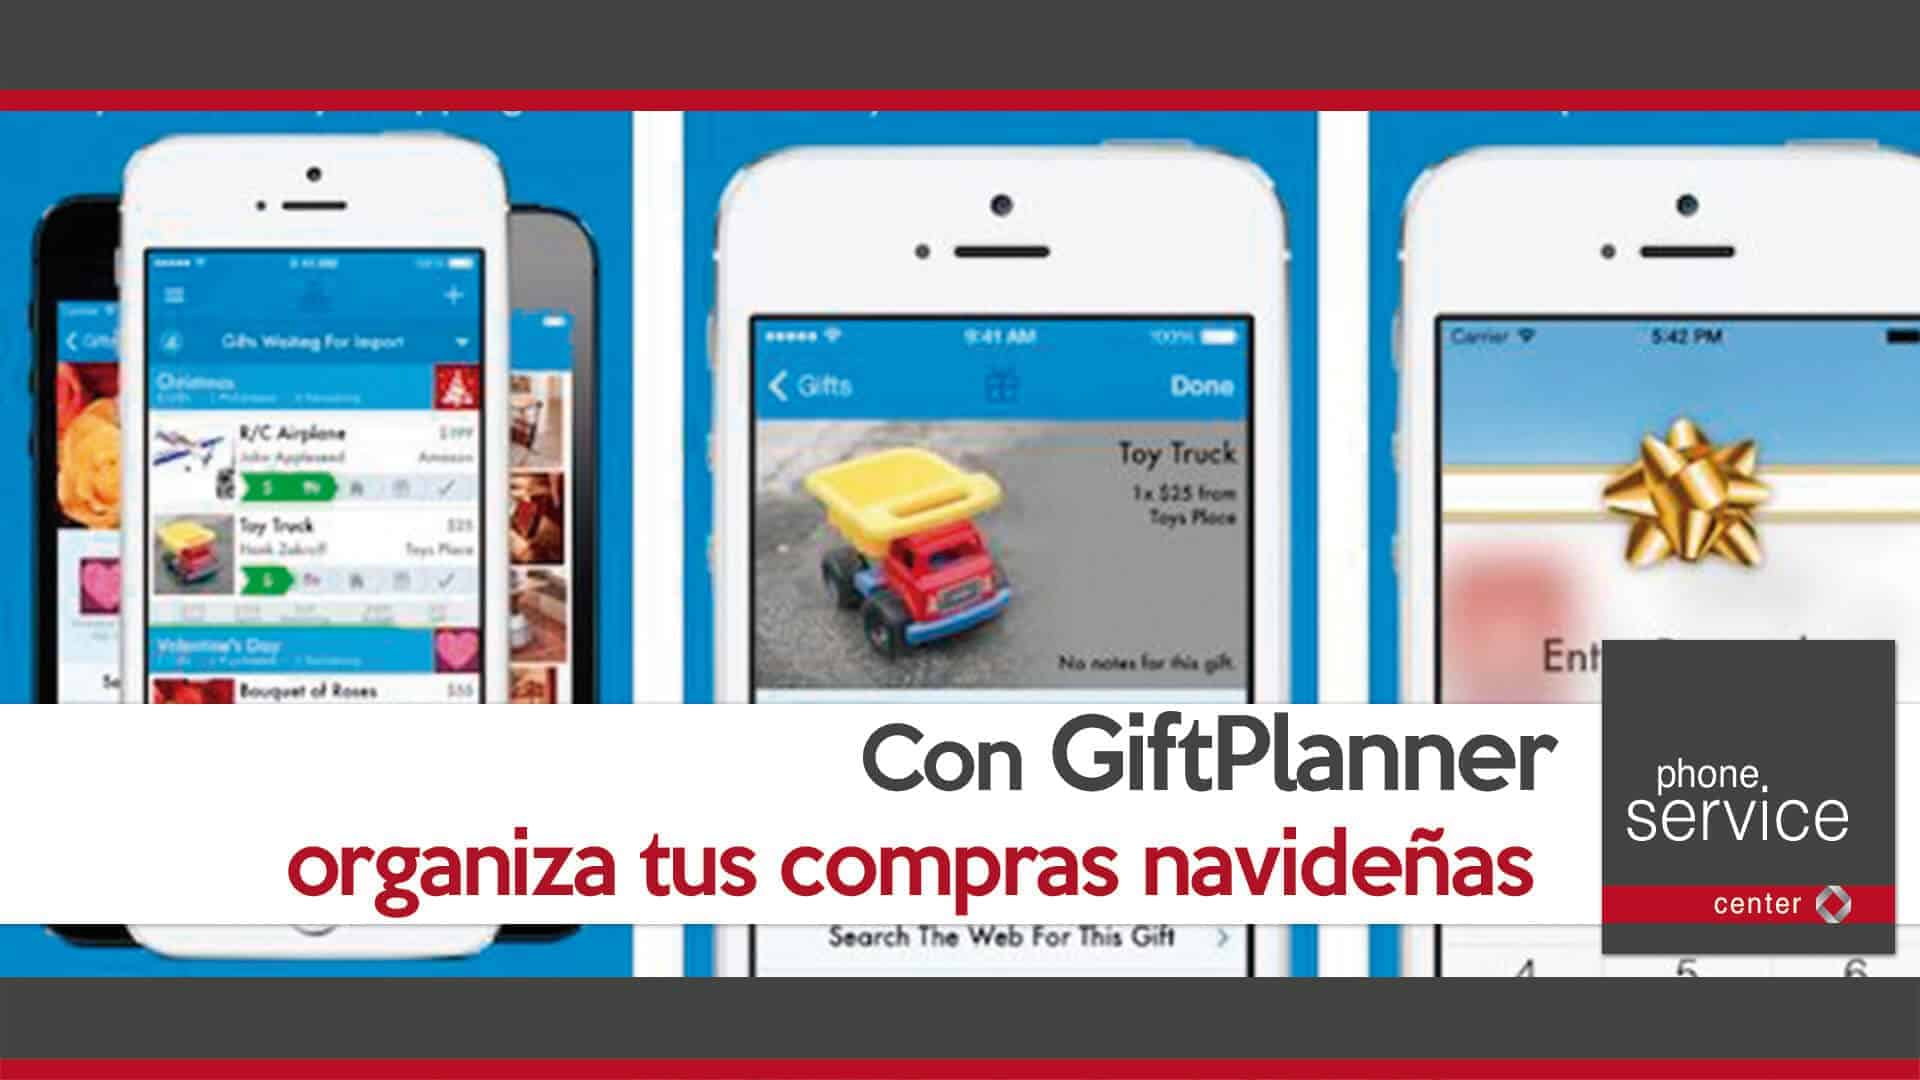 giftplanner-organiza-tus-compras-navidenas